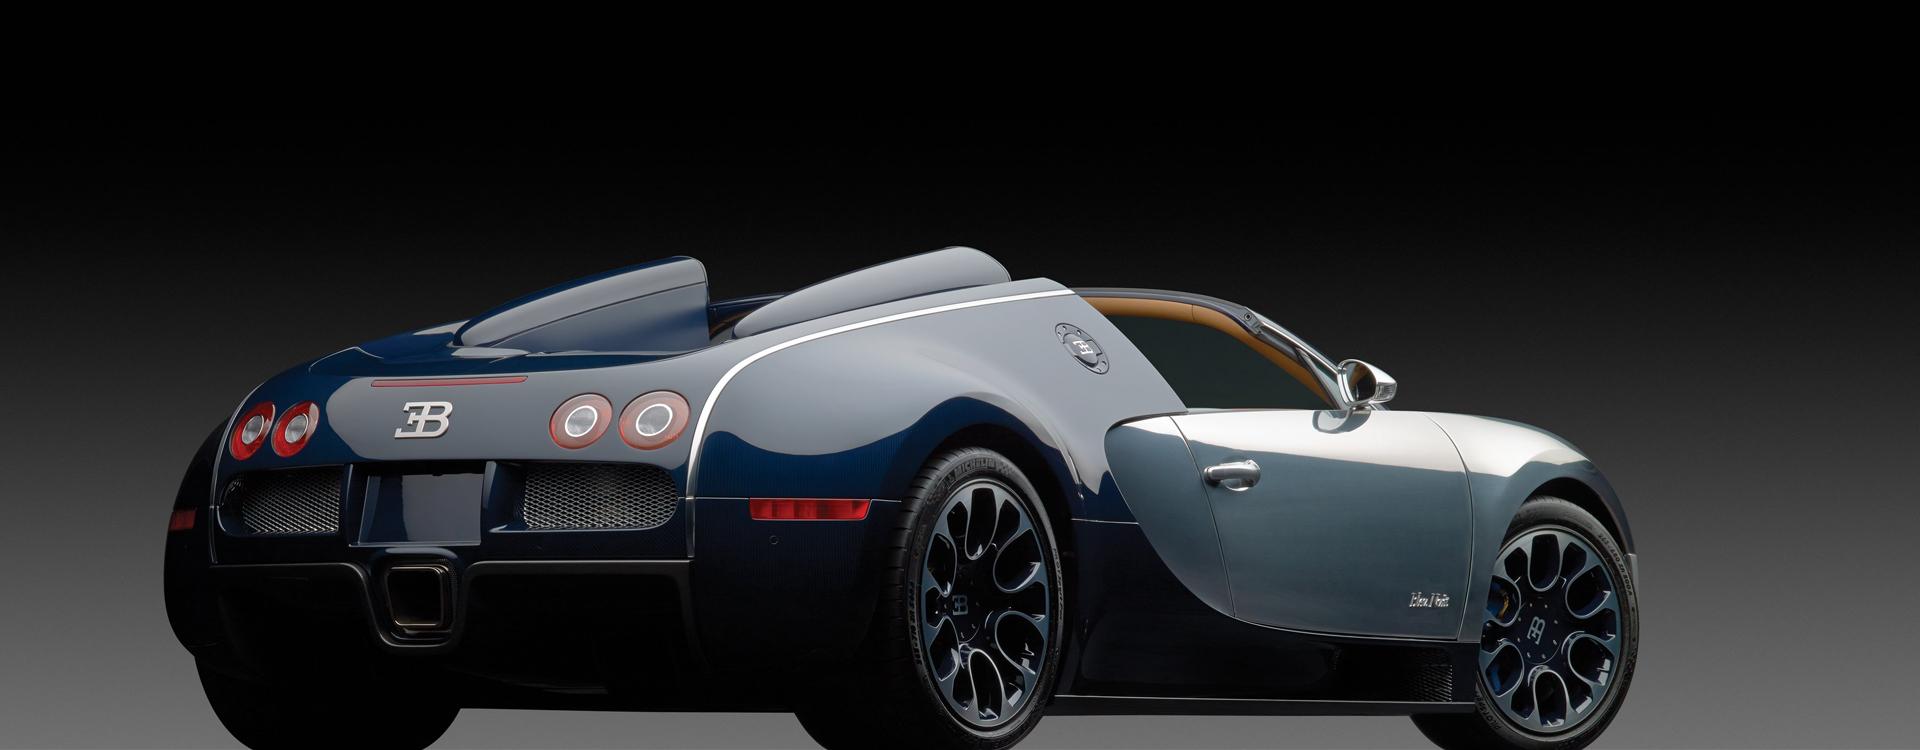 Motorcar Classics - Exotic & Classic Car Storage